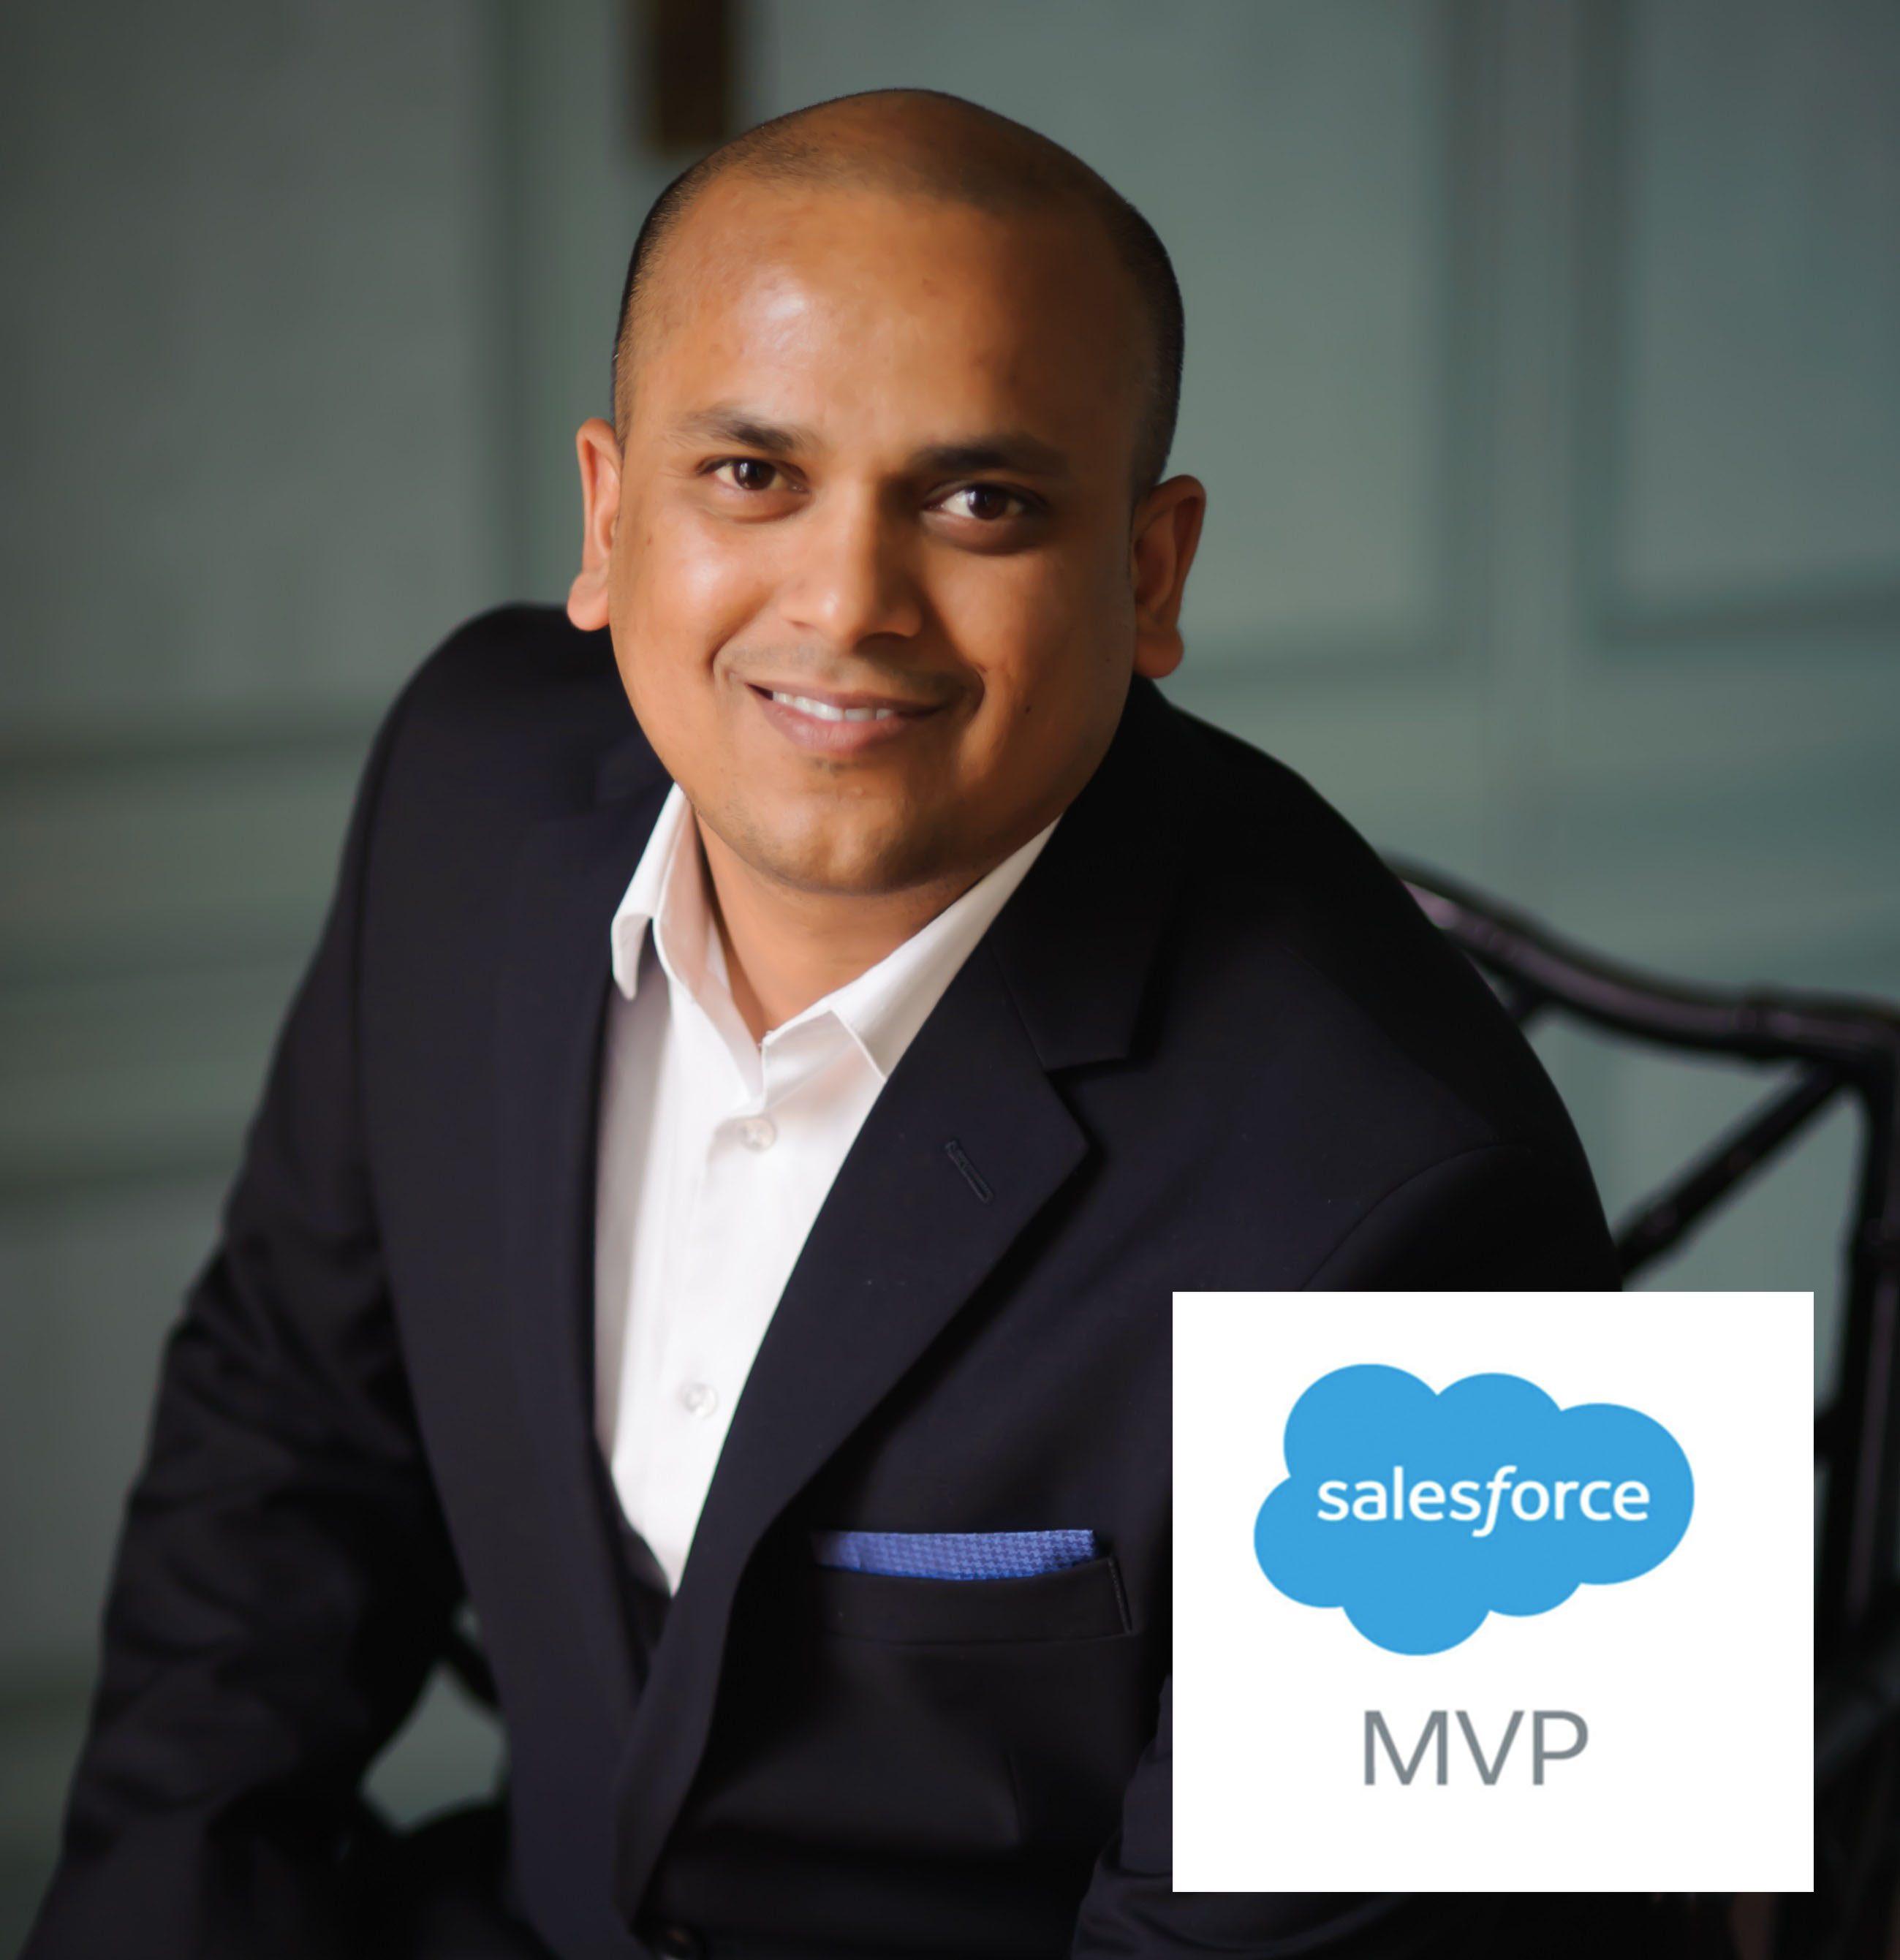 Salesforce Influencers - Jitendra Zaa